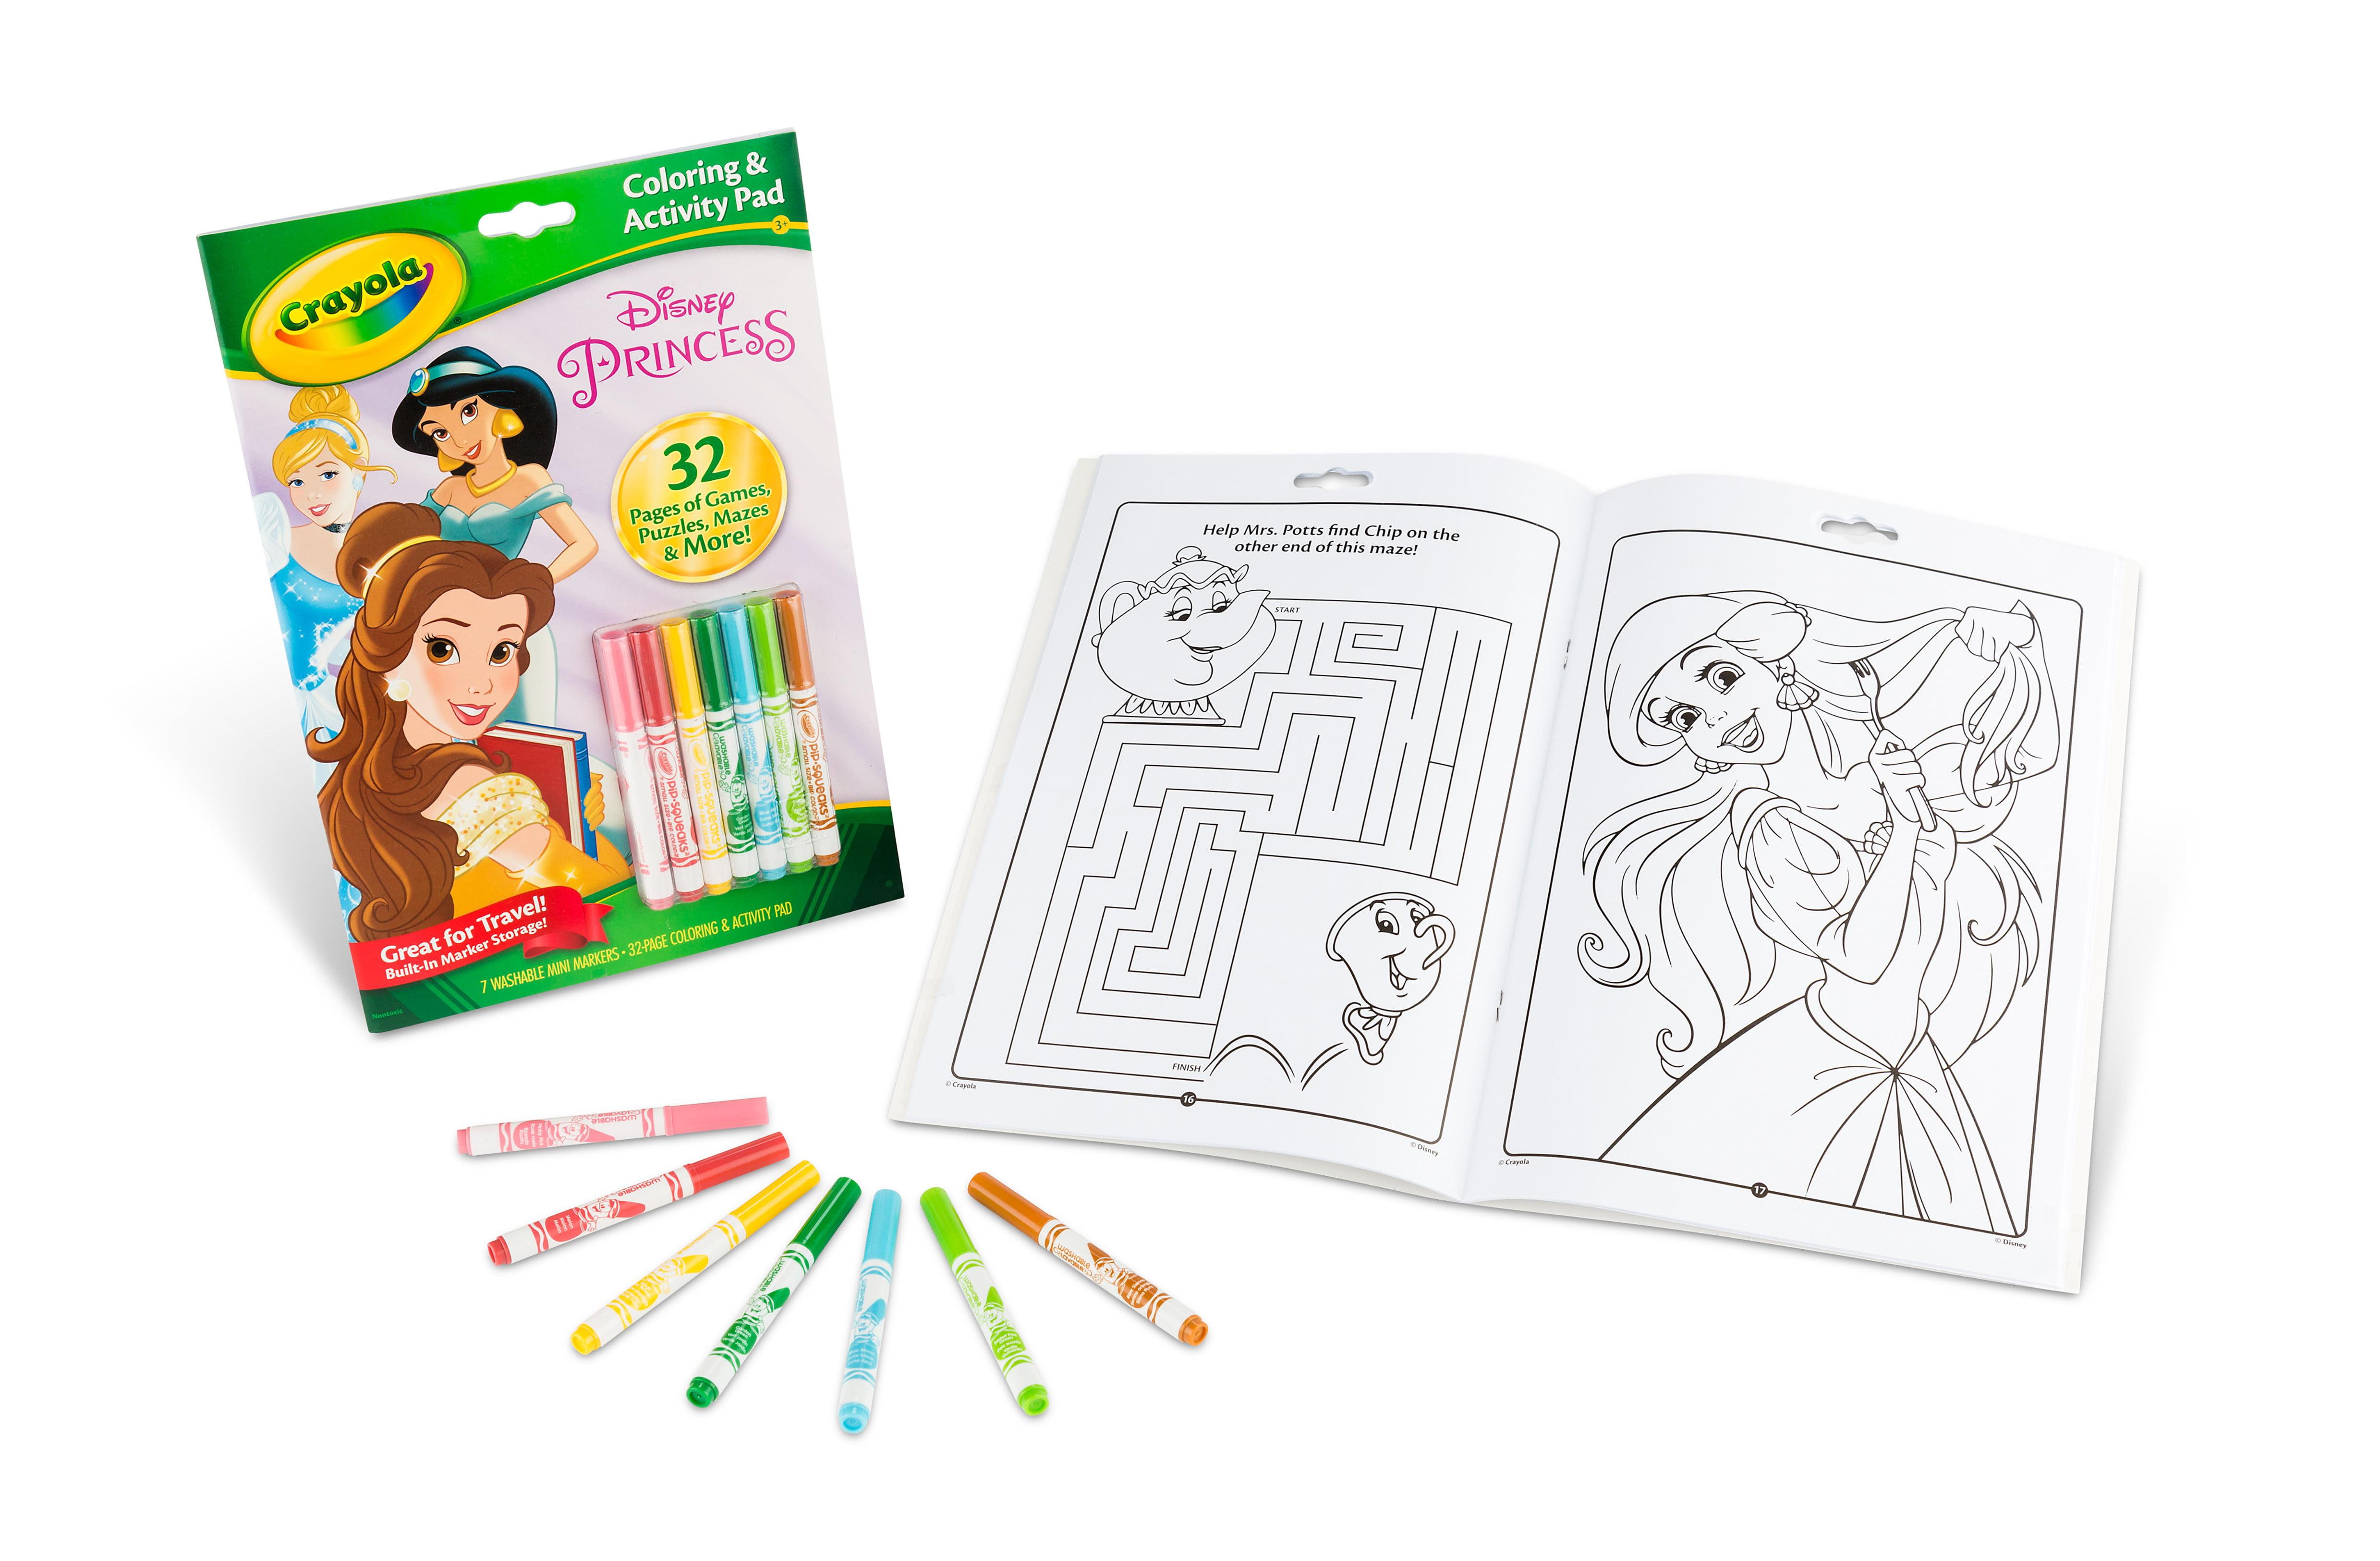 Crayola Disney Princess Coloring and Activity Book, 10 pages   Walmart.com